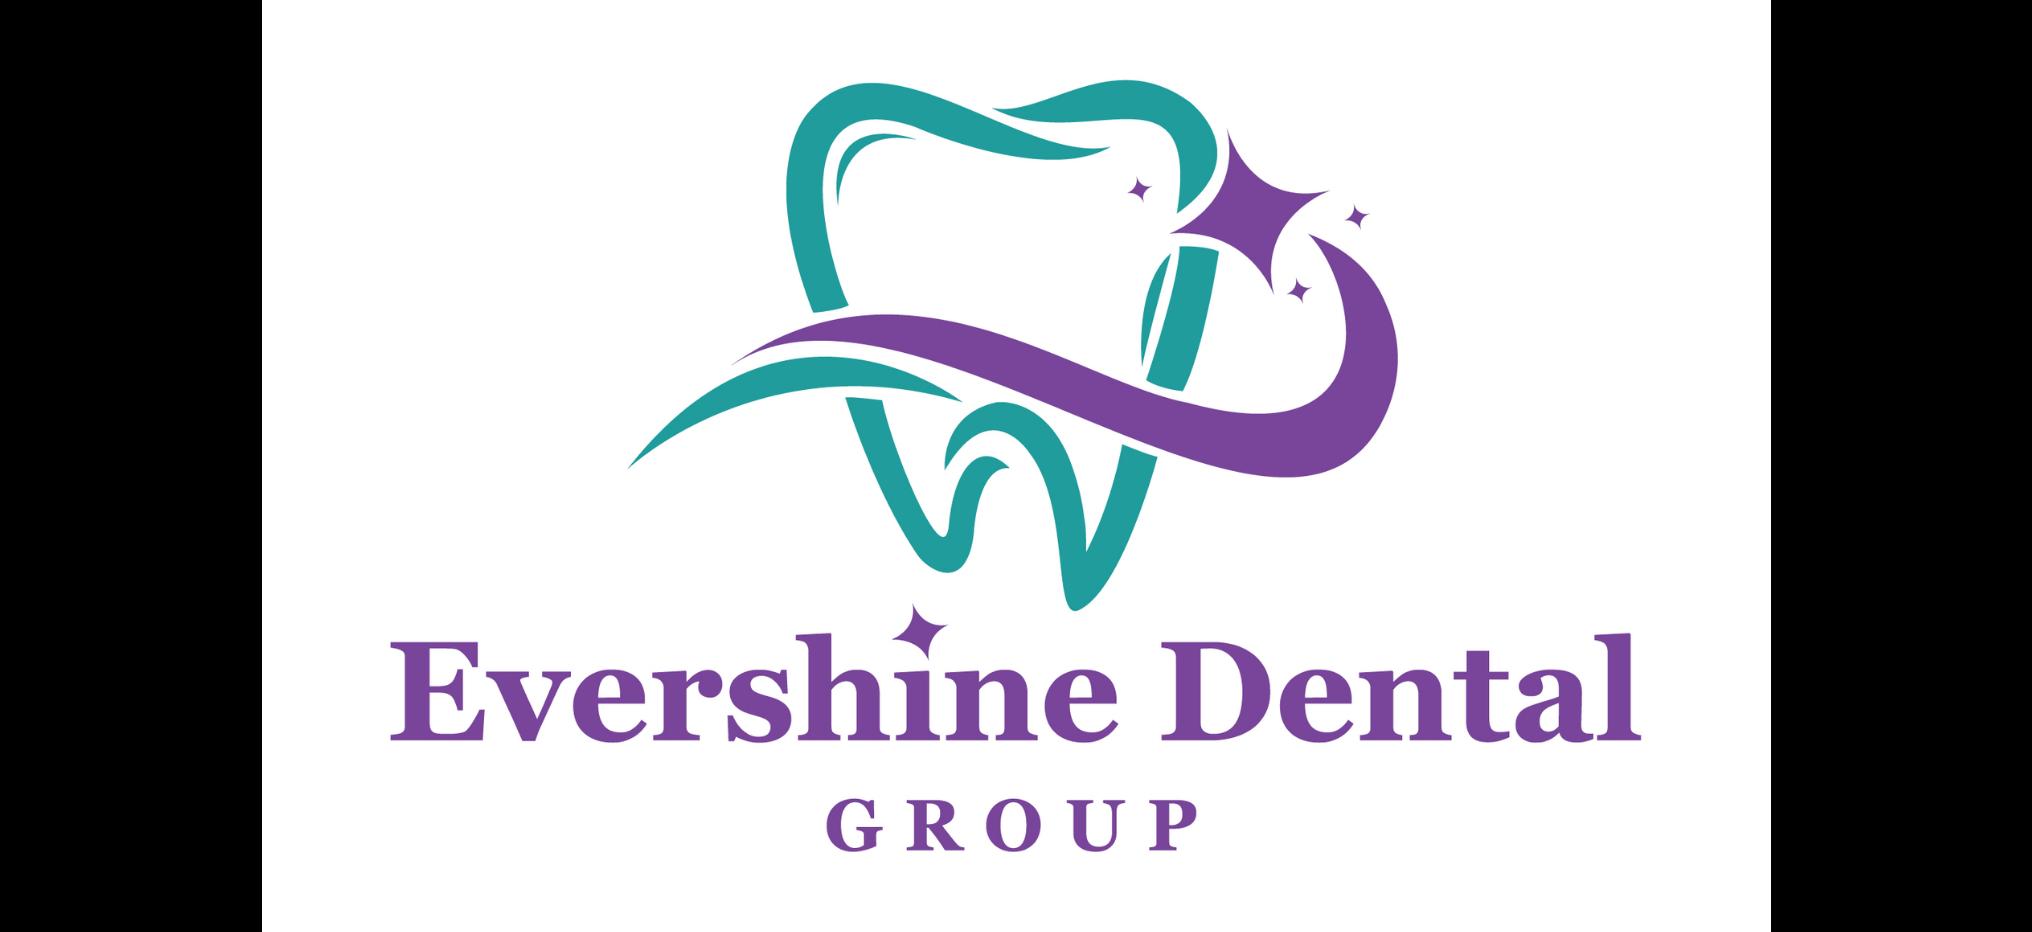 Evershine Dental Group Logo